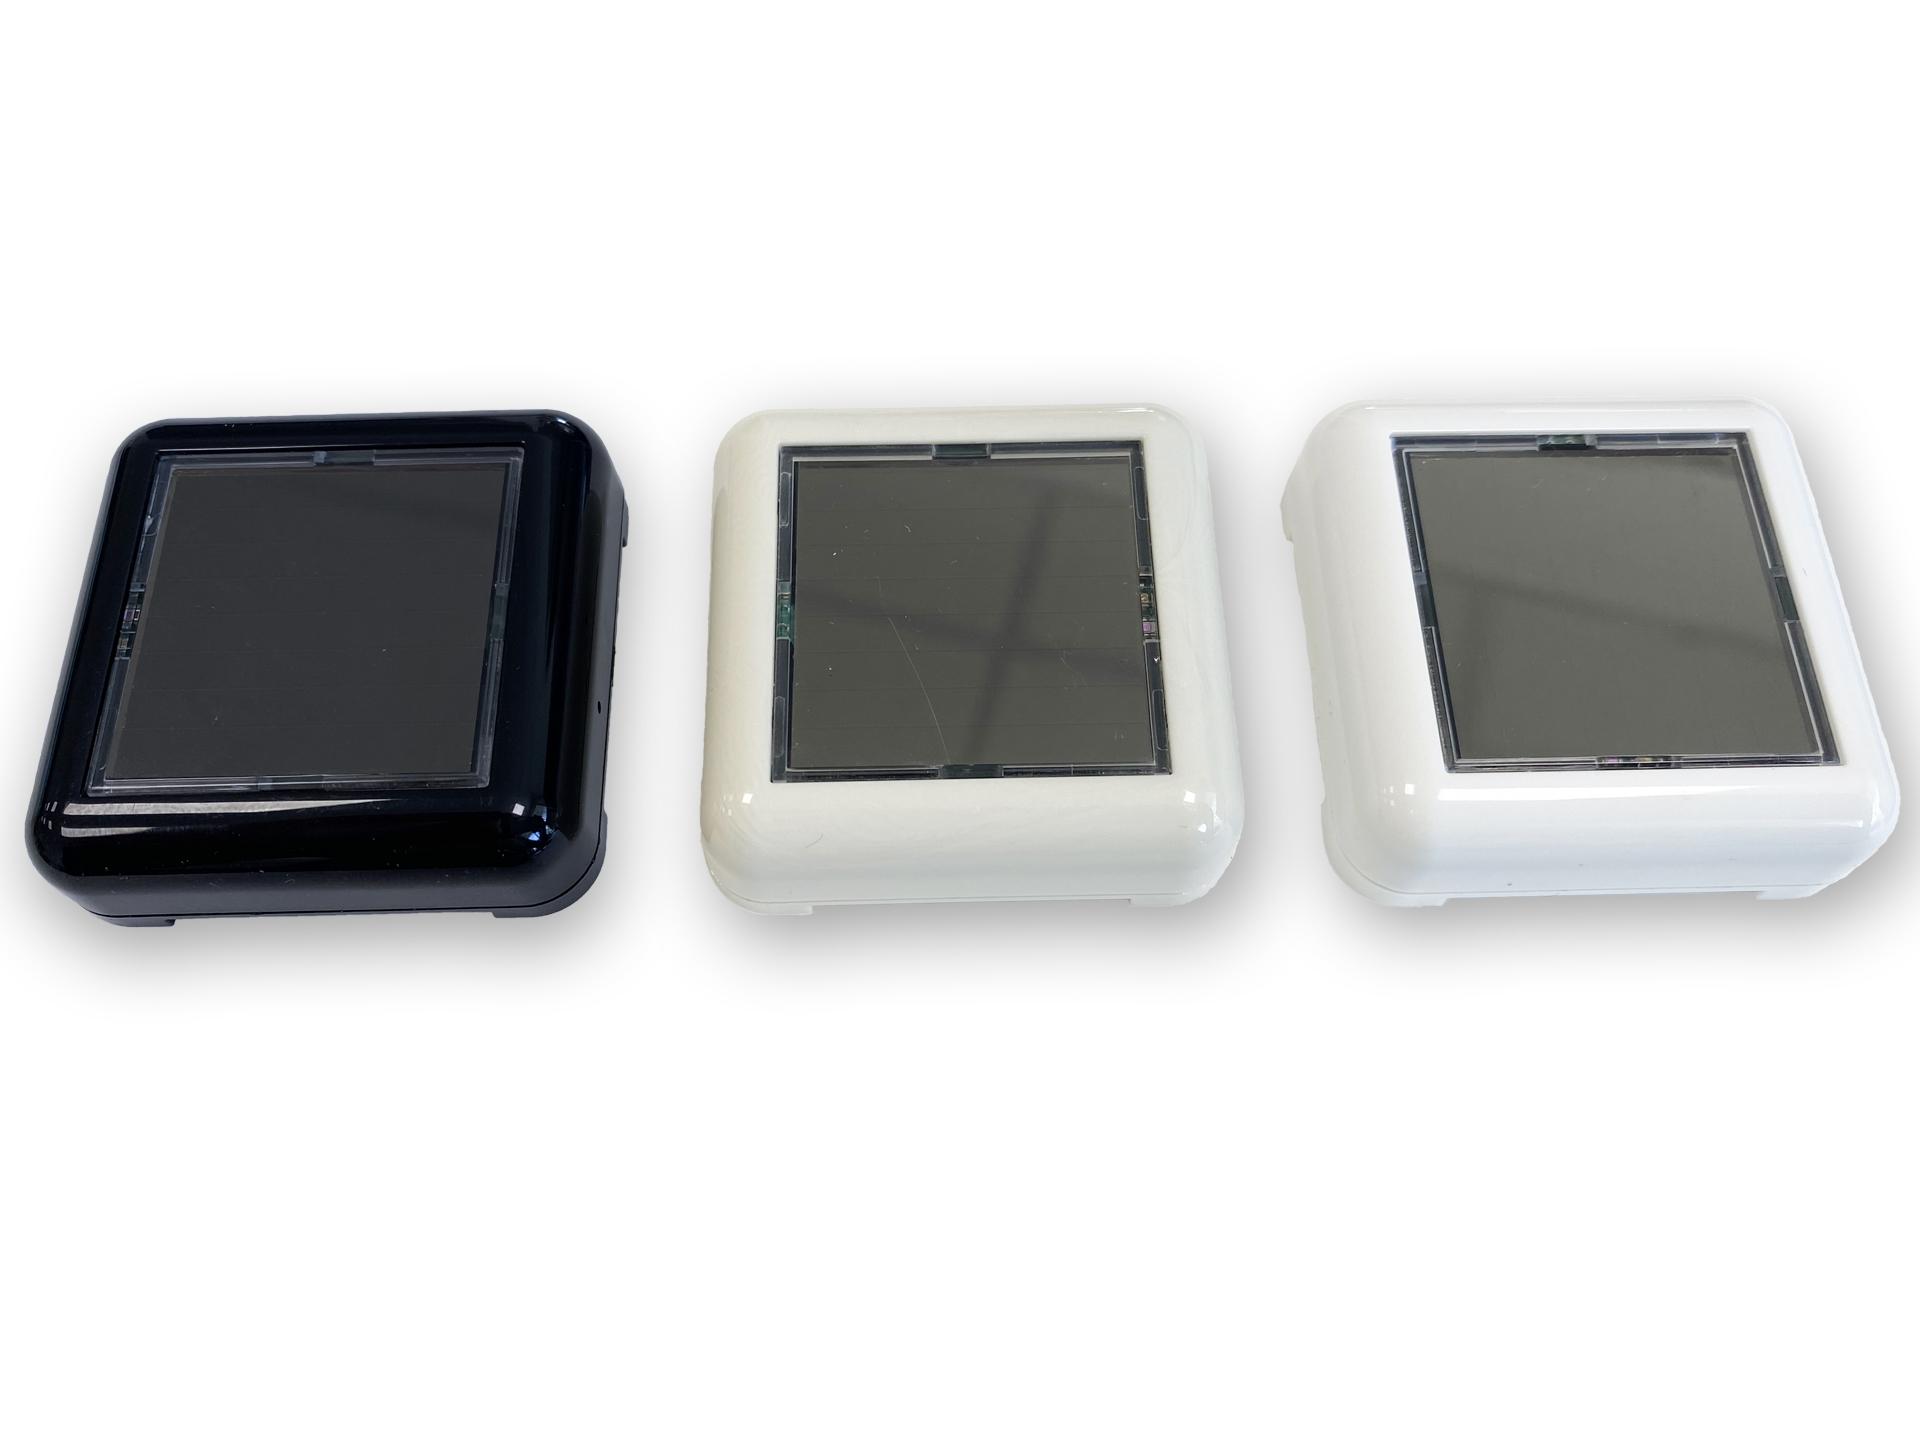 AL-431-00-902 EnOcean Multisensor EnoSense Wall & Desk DEUTA Controls